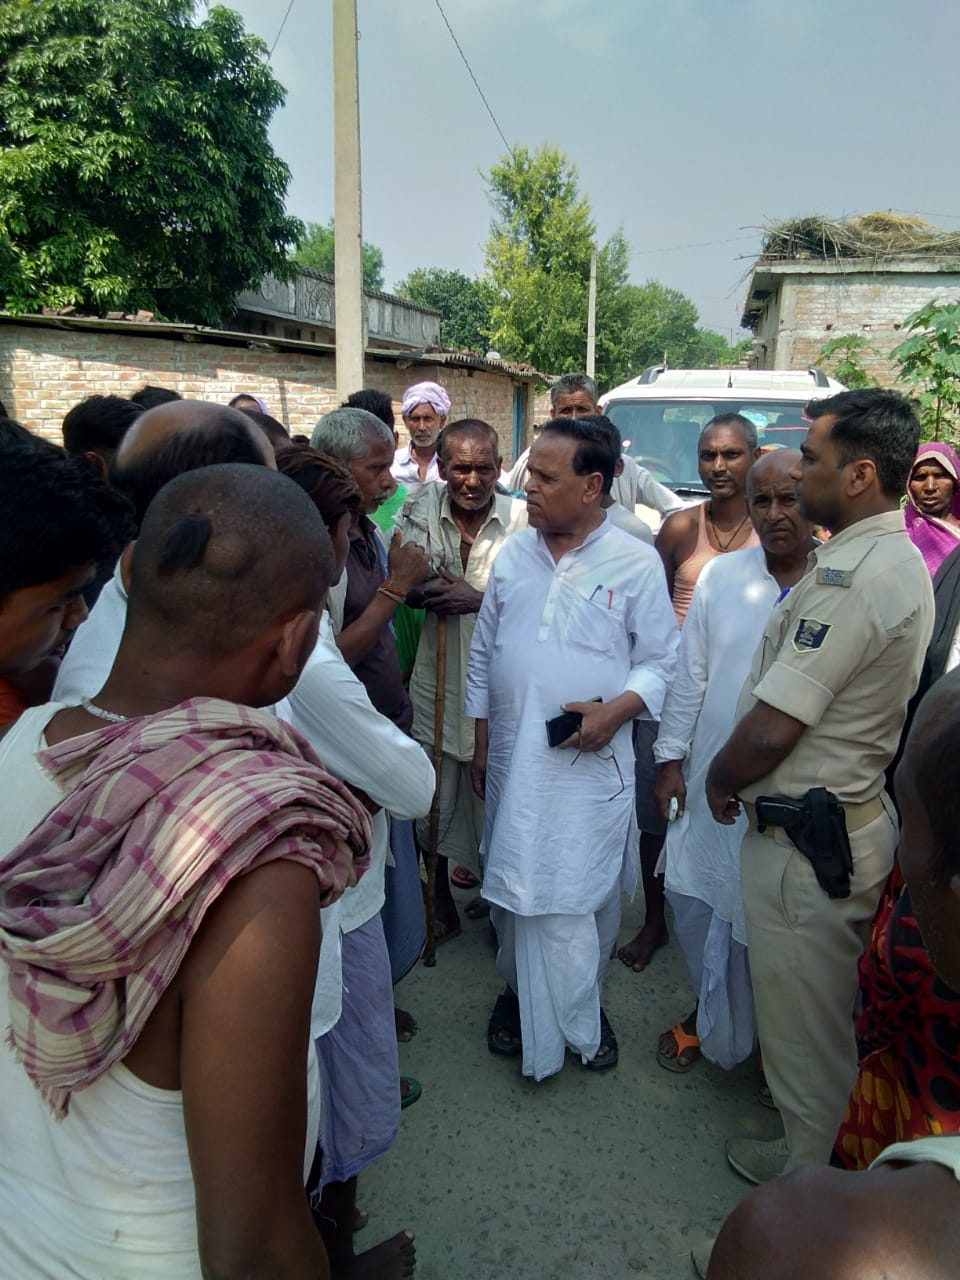 हिंदी समाचार |सीपीआई कार्यकर्ताओ का पद...